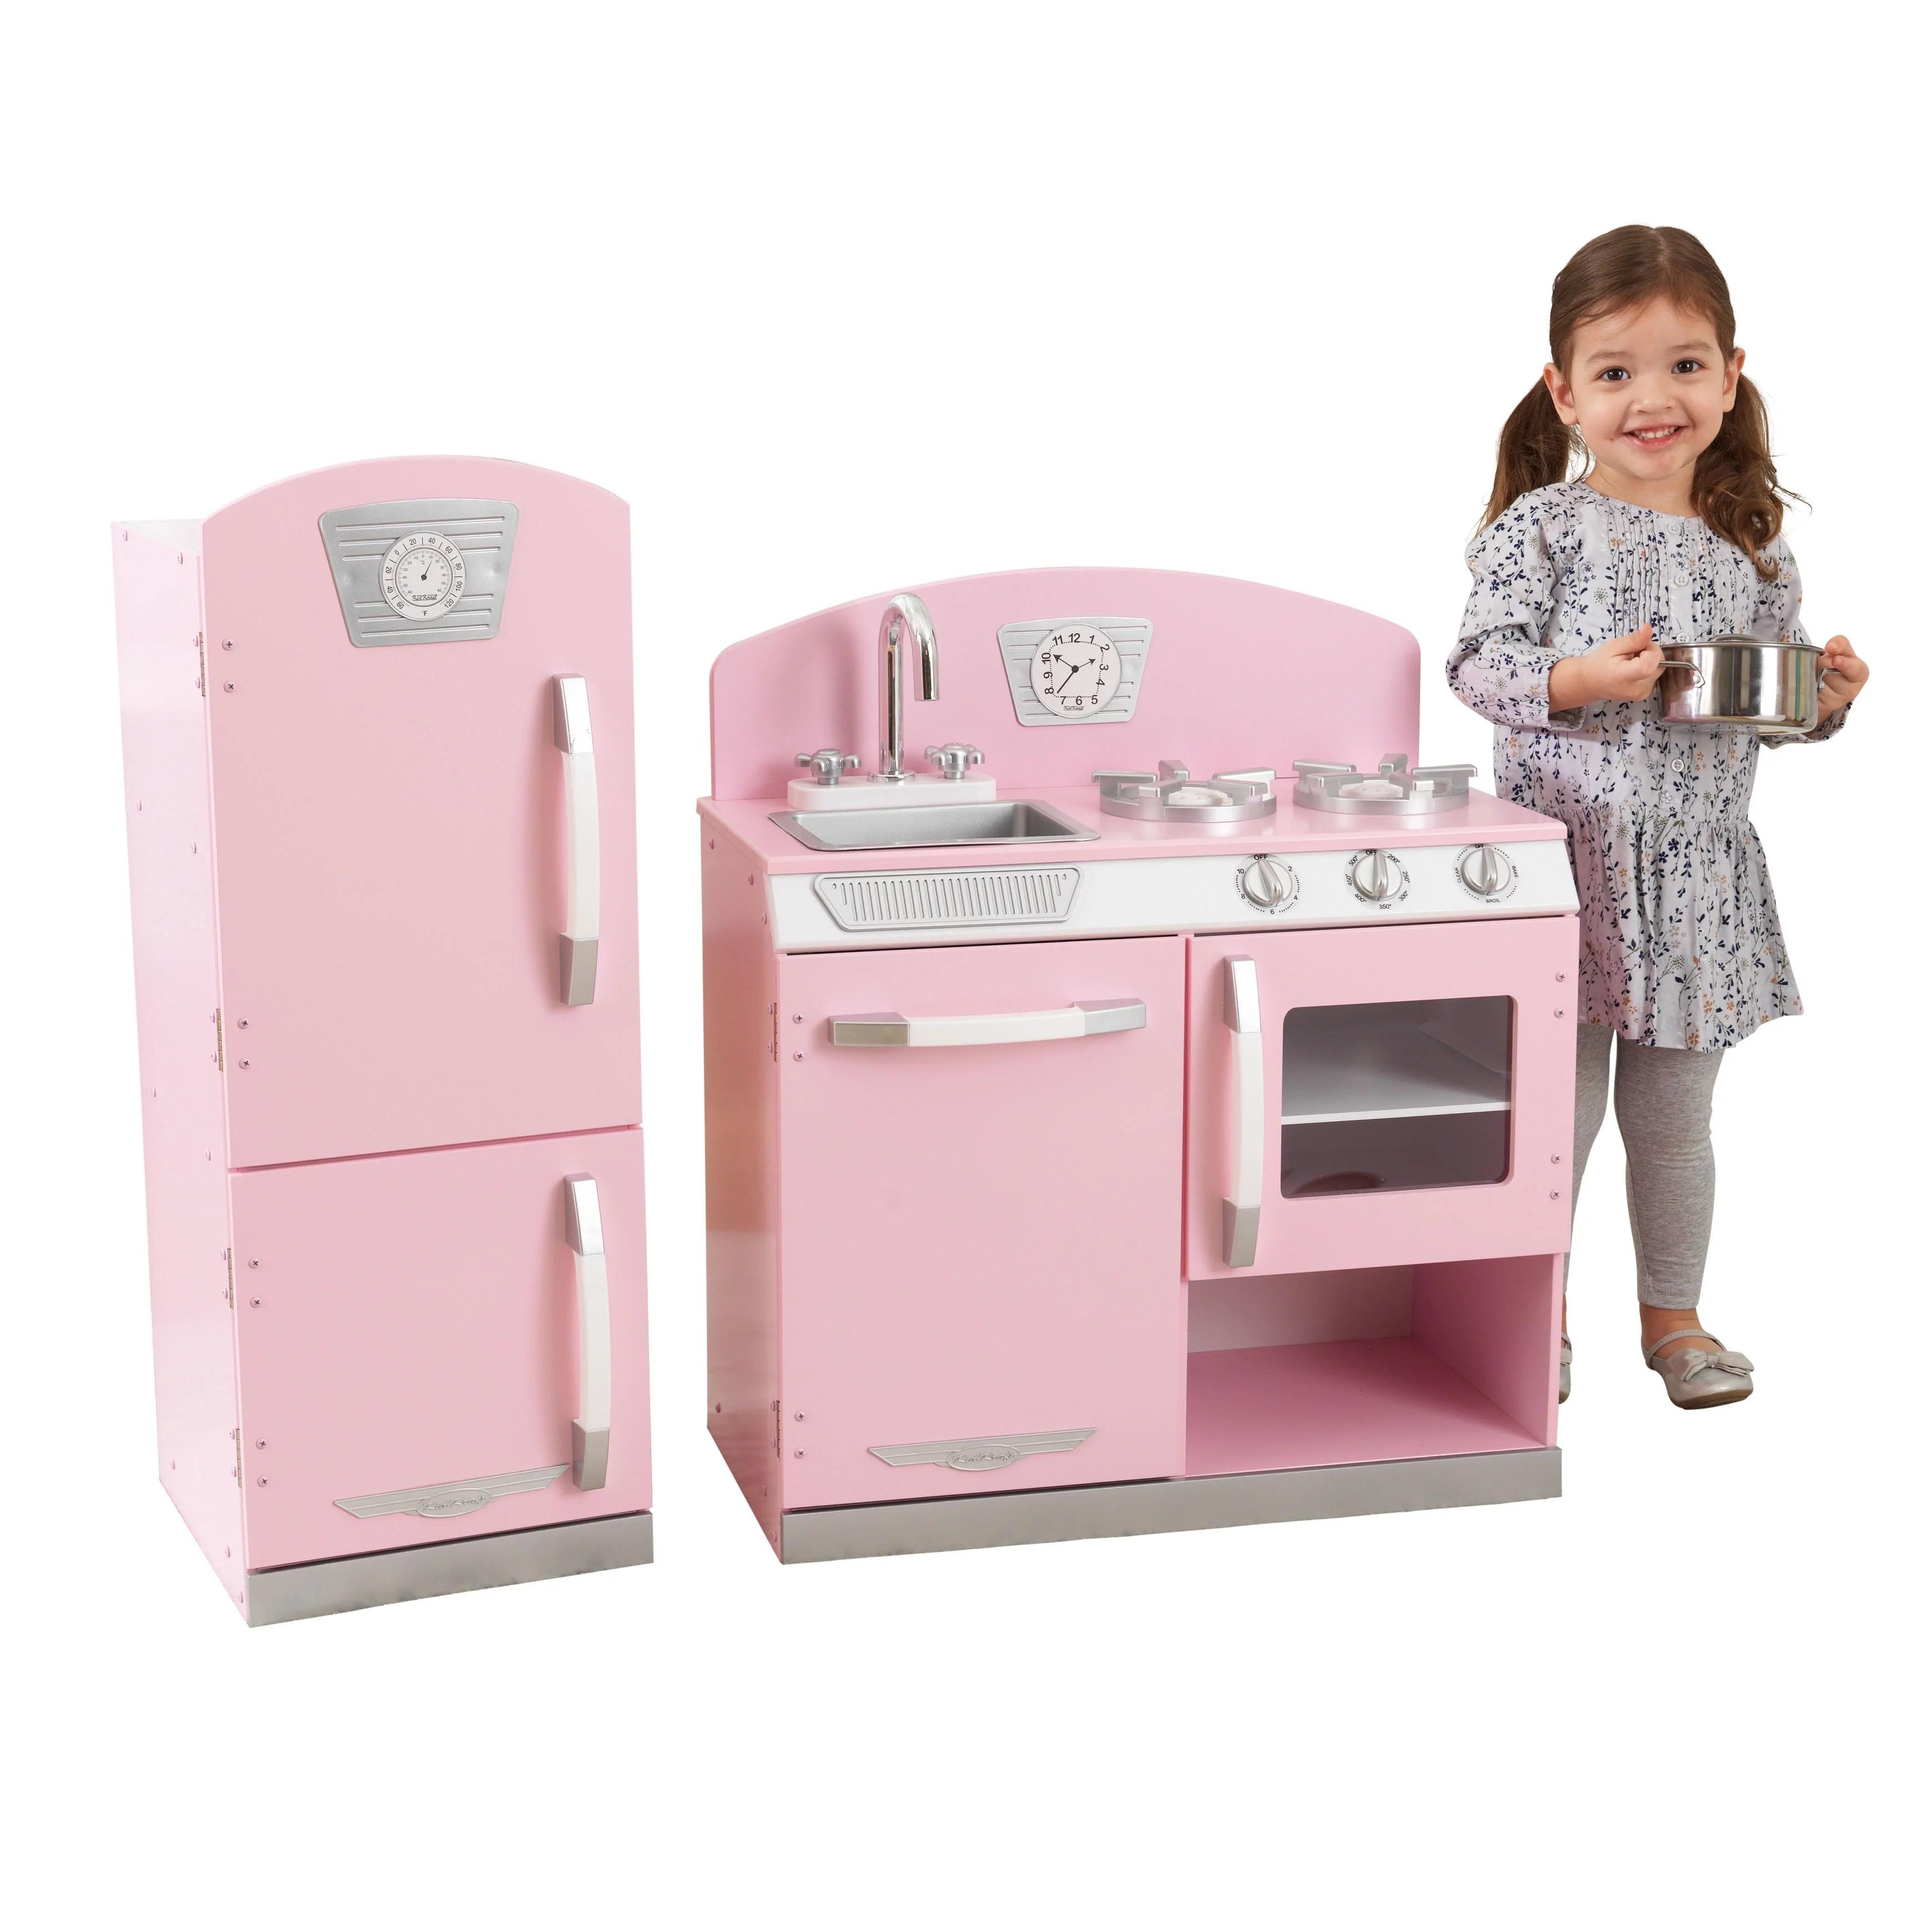 KidKraft Pink Retro Kitchen  Refrigerator  Walmartcom